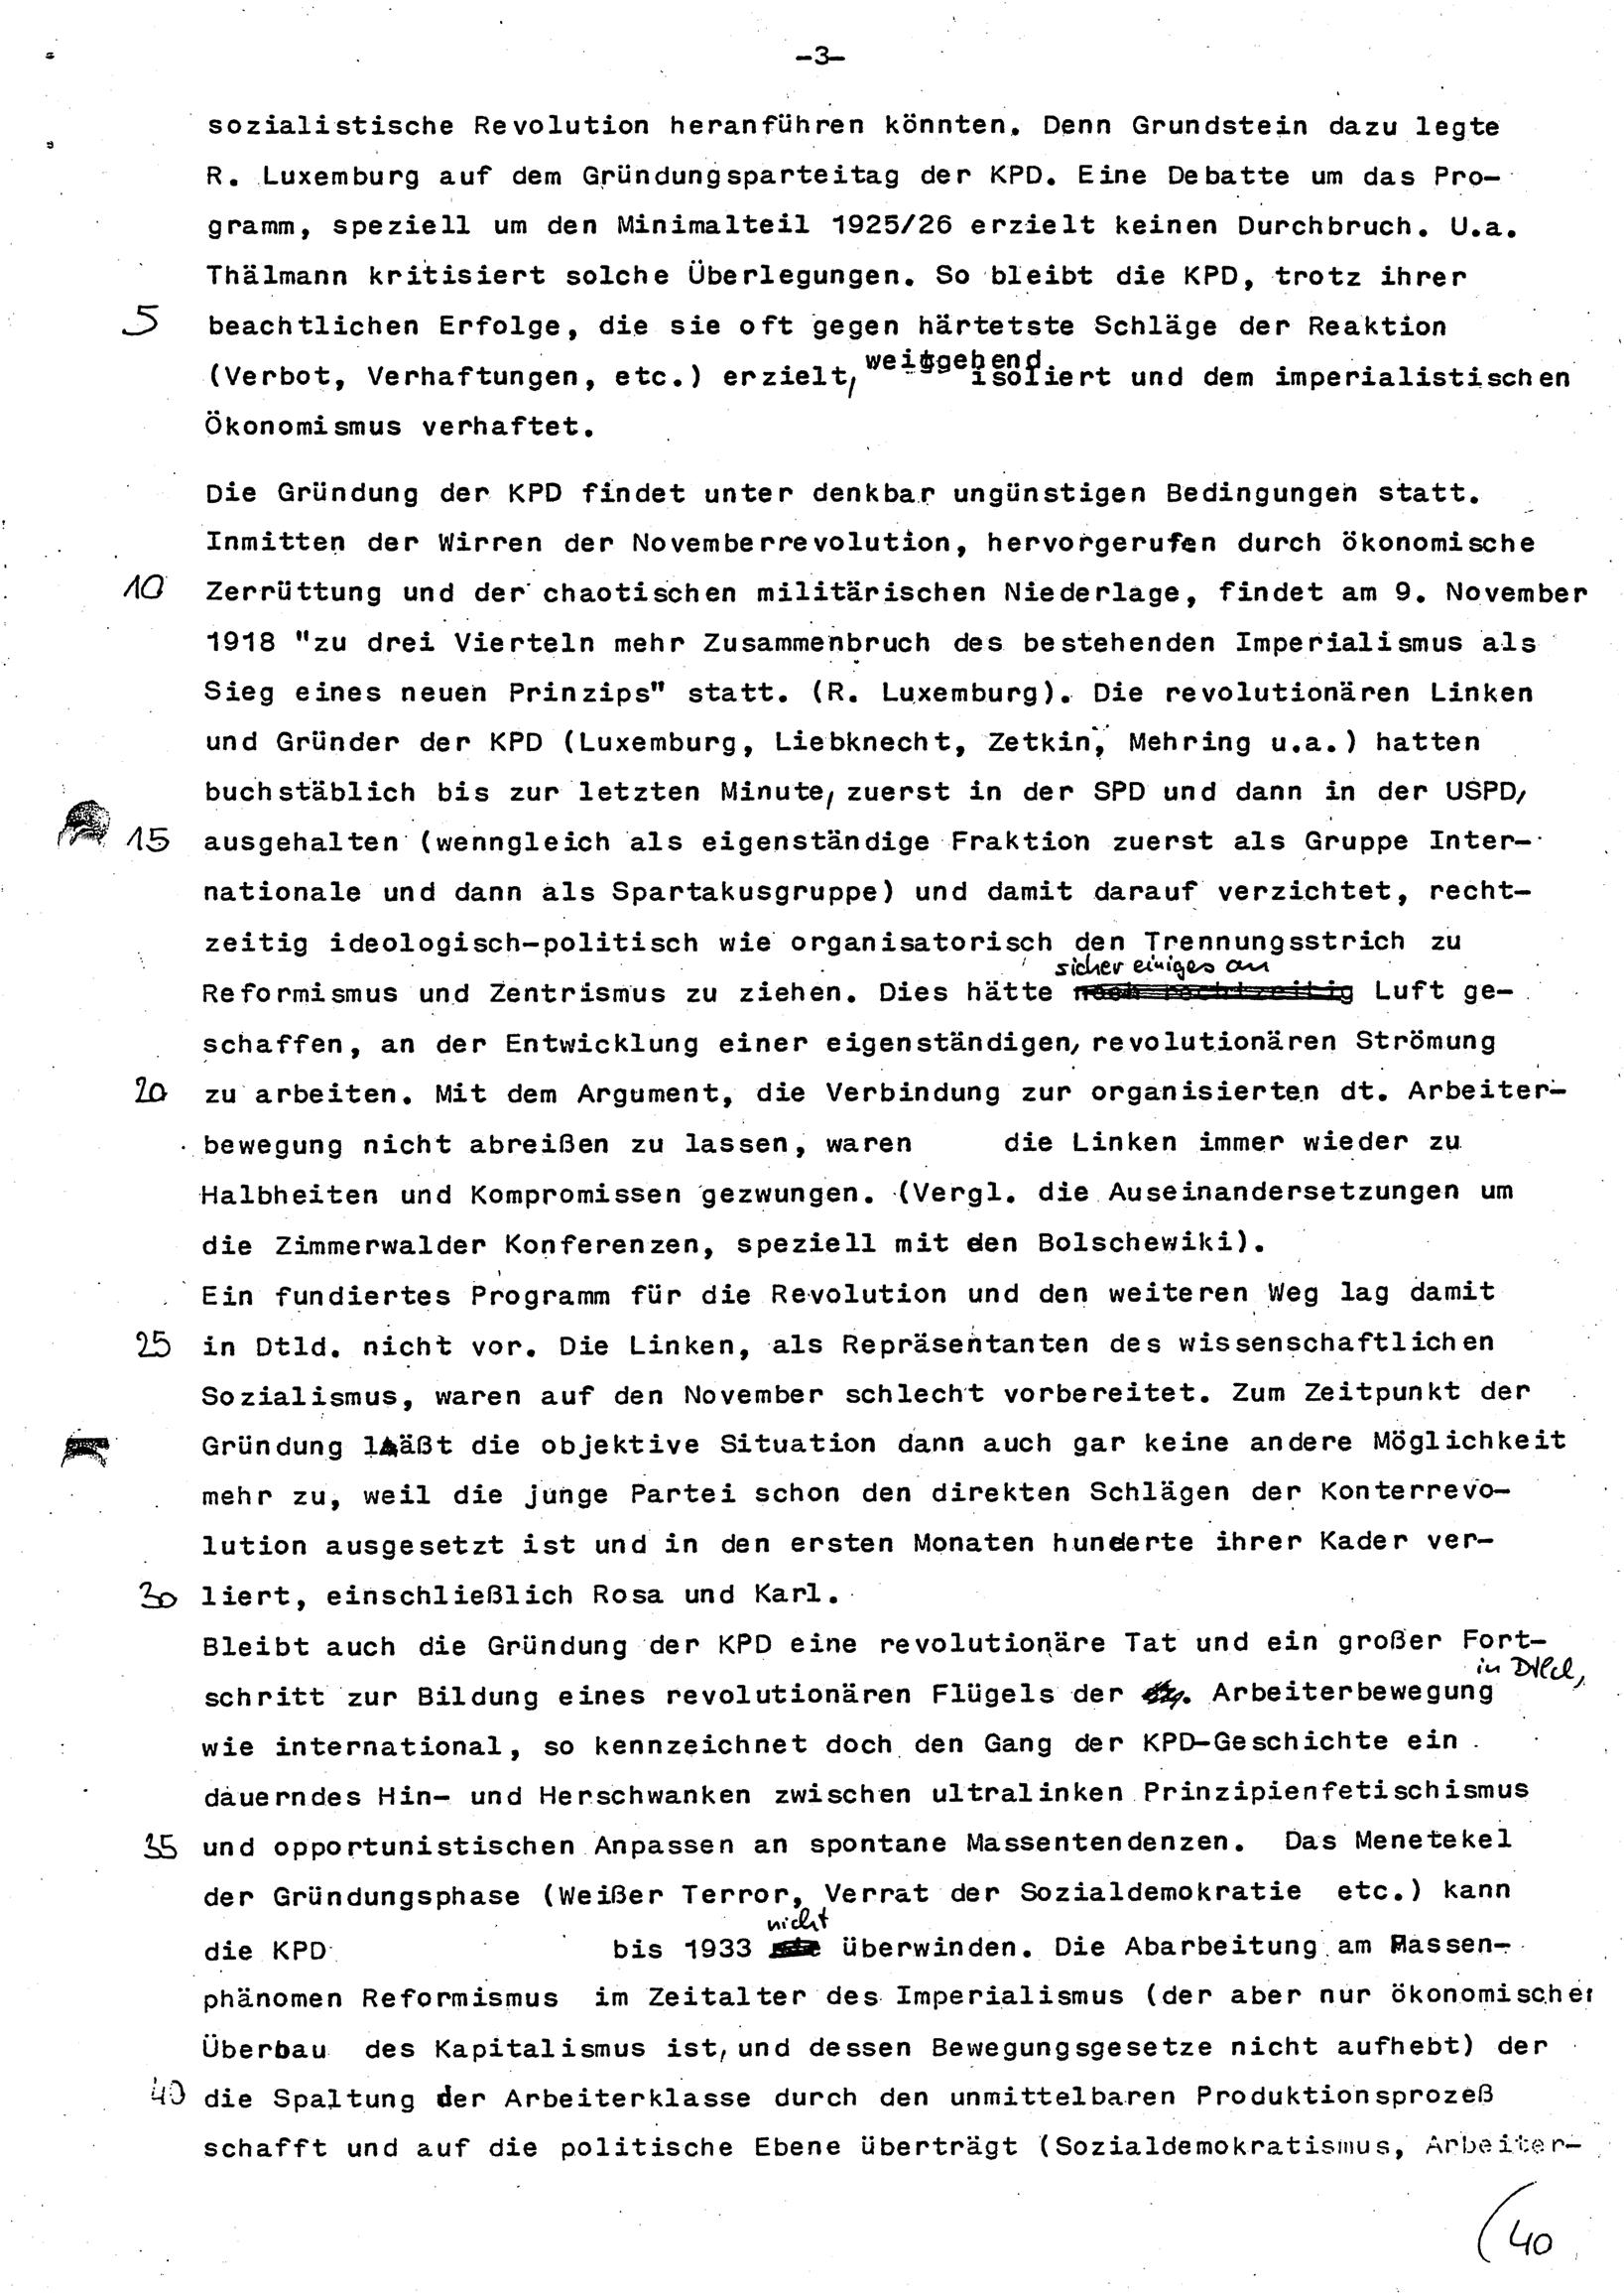 Ulm_KGU_Arbeitsheft_19830425_015_043